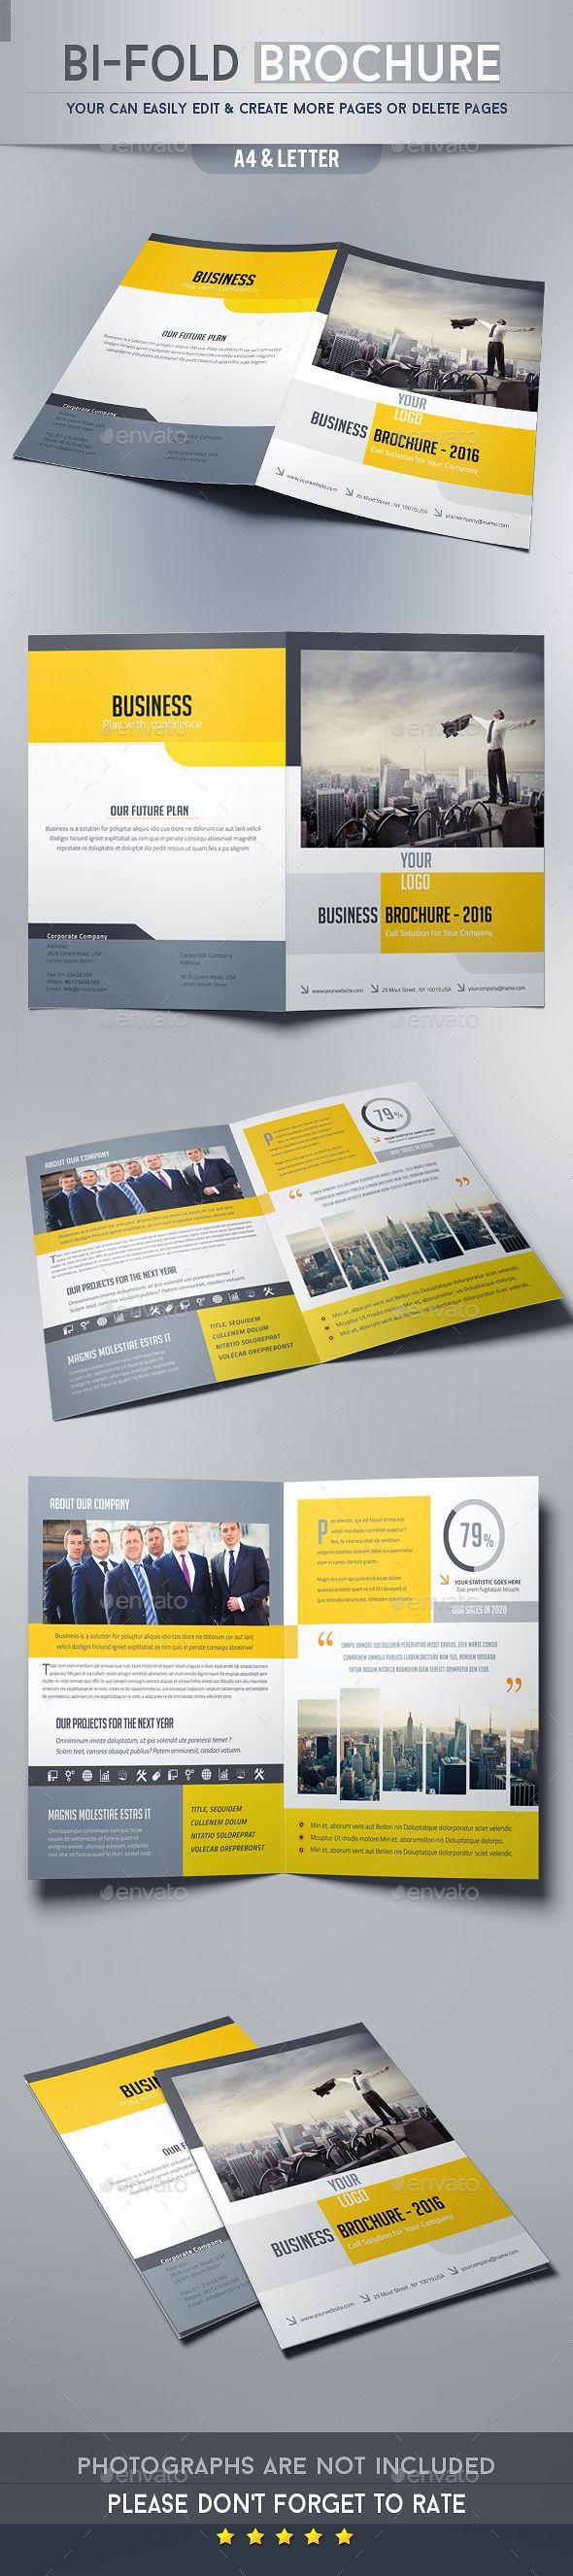 Bi-fold Brochure Template InDesign INDD #design Download: http://graphicriver.net/item/bifold-brochure-template/14029047?ref=ksioks